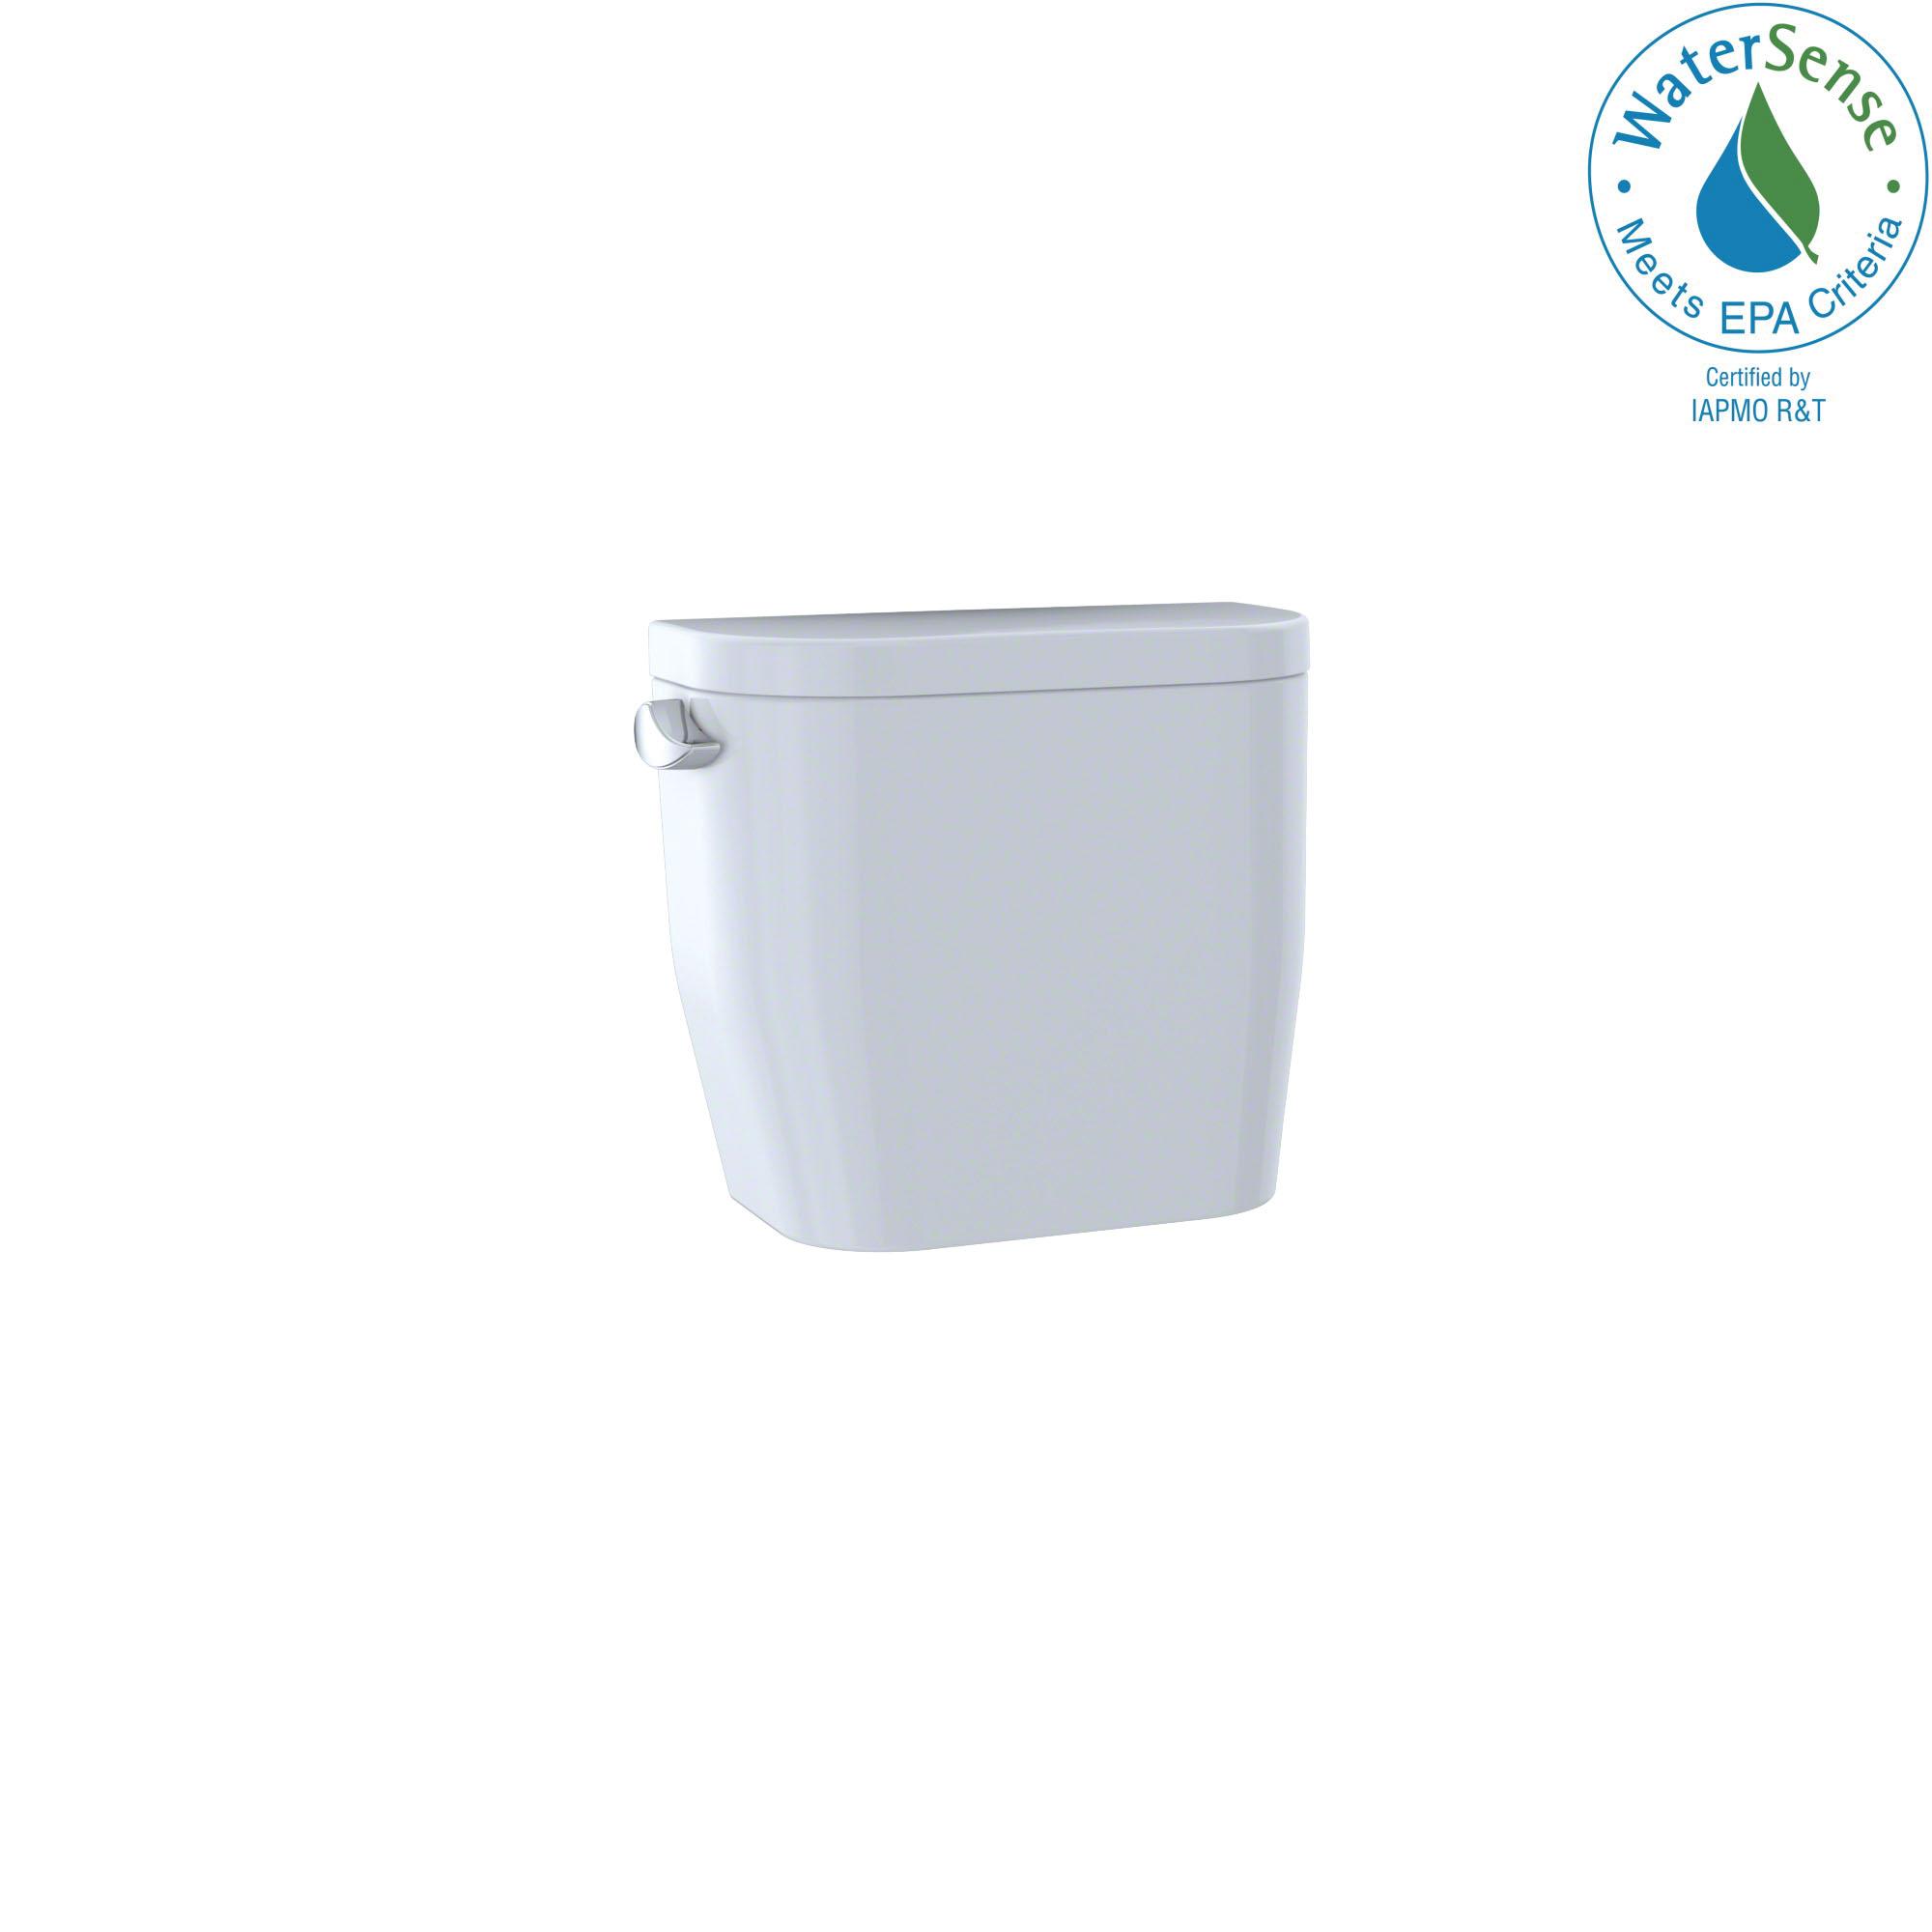 Toto® ST243E#01 Tank and Cover, 1.28, Left Hand Lever Flush, Cotton White, Import